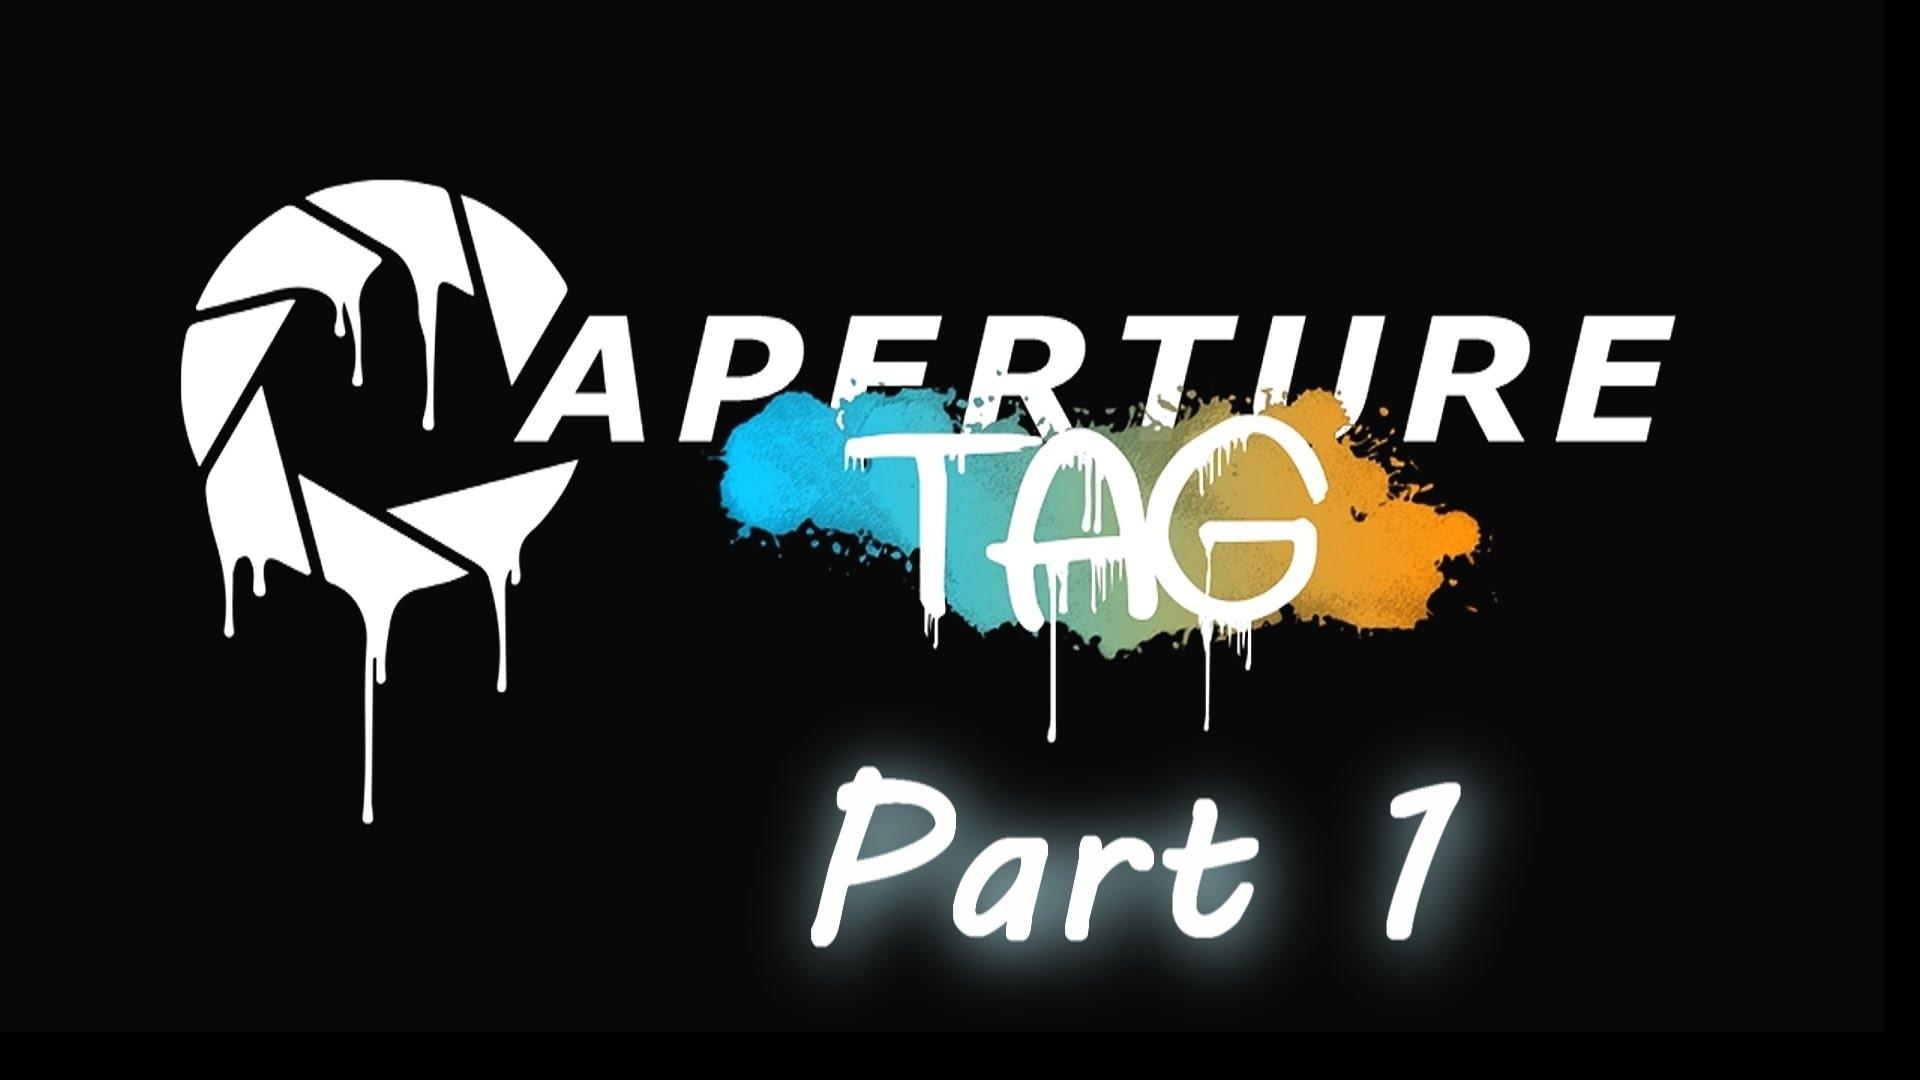 1920x1080 > Aperture Tag: The Paint Gun Testing Initiative Wallpapers